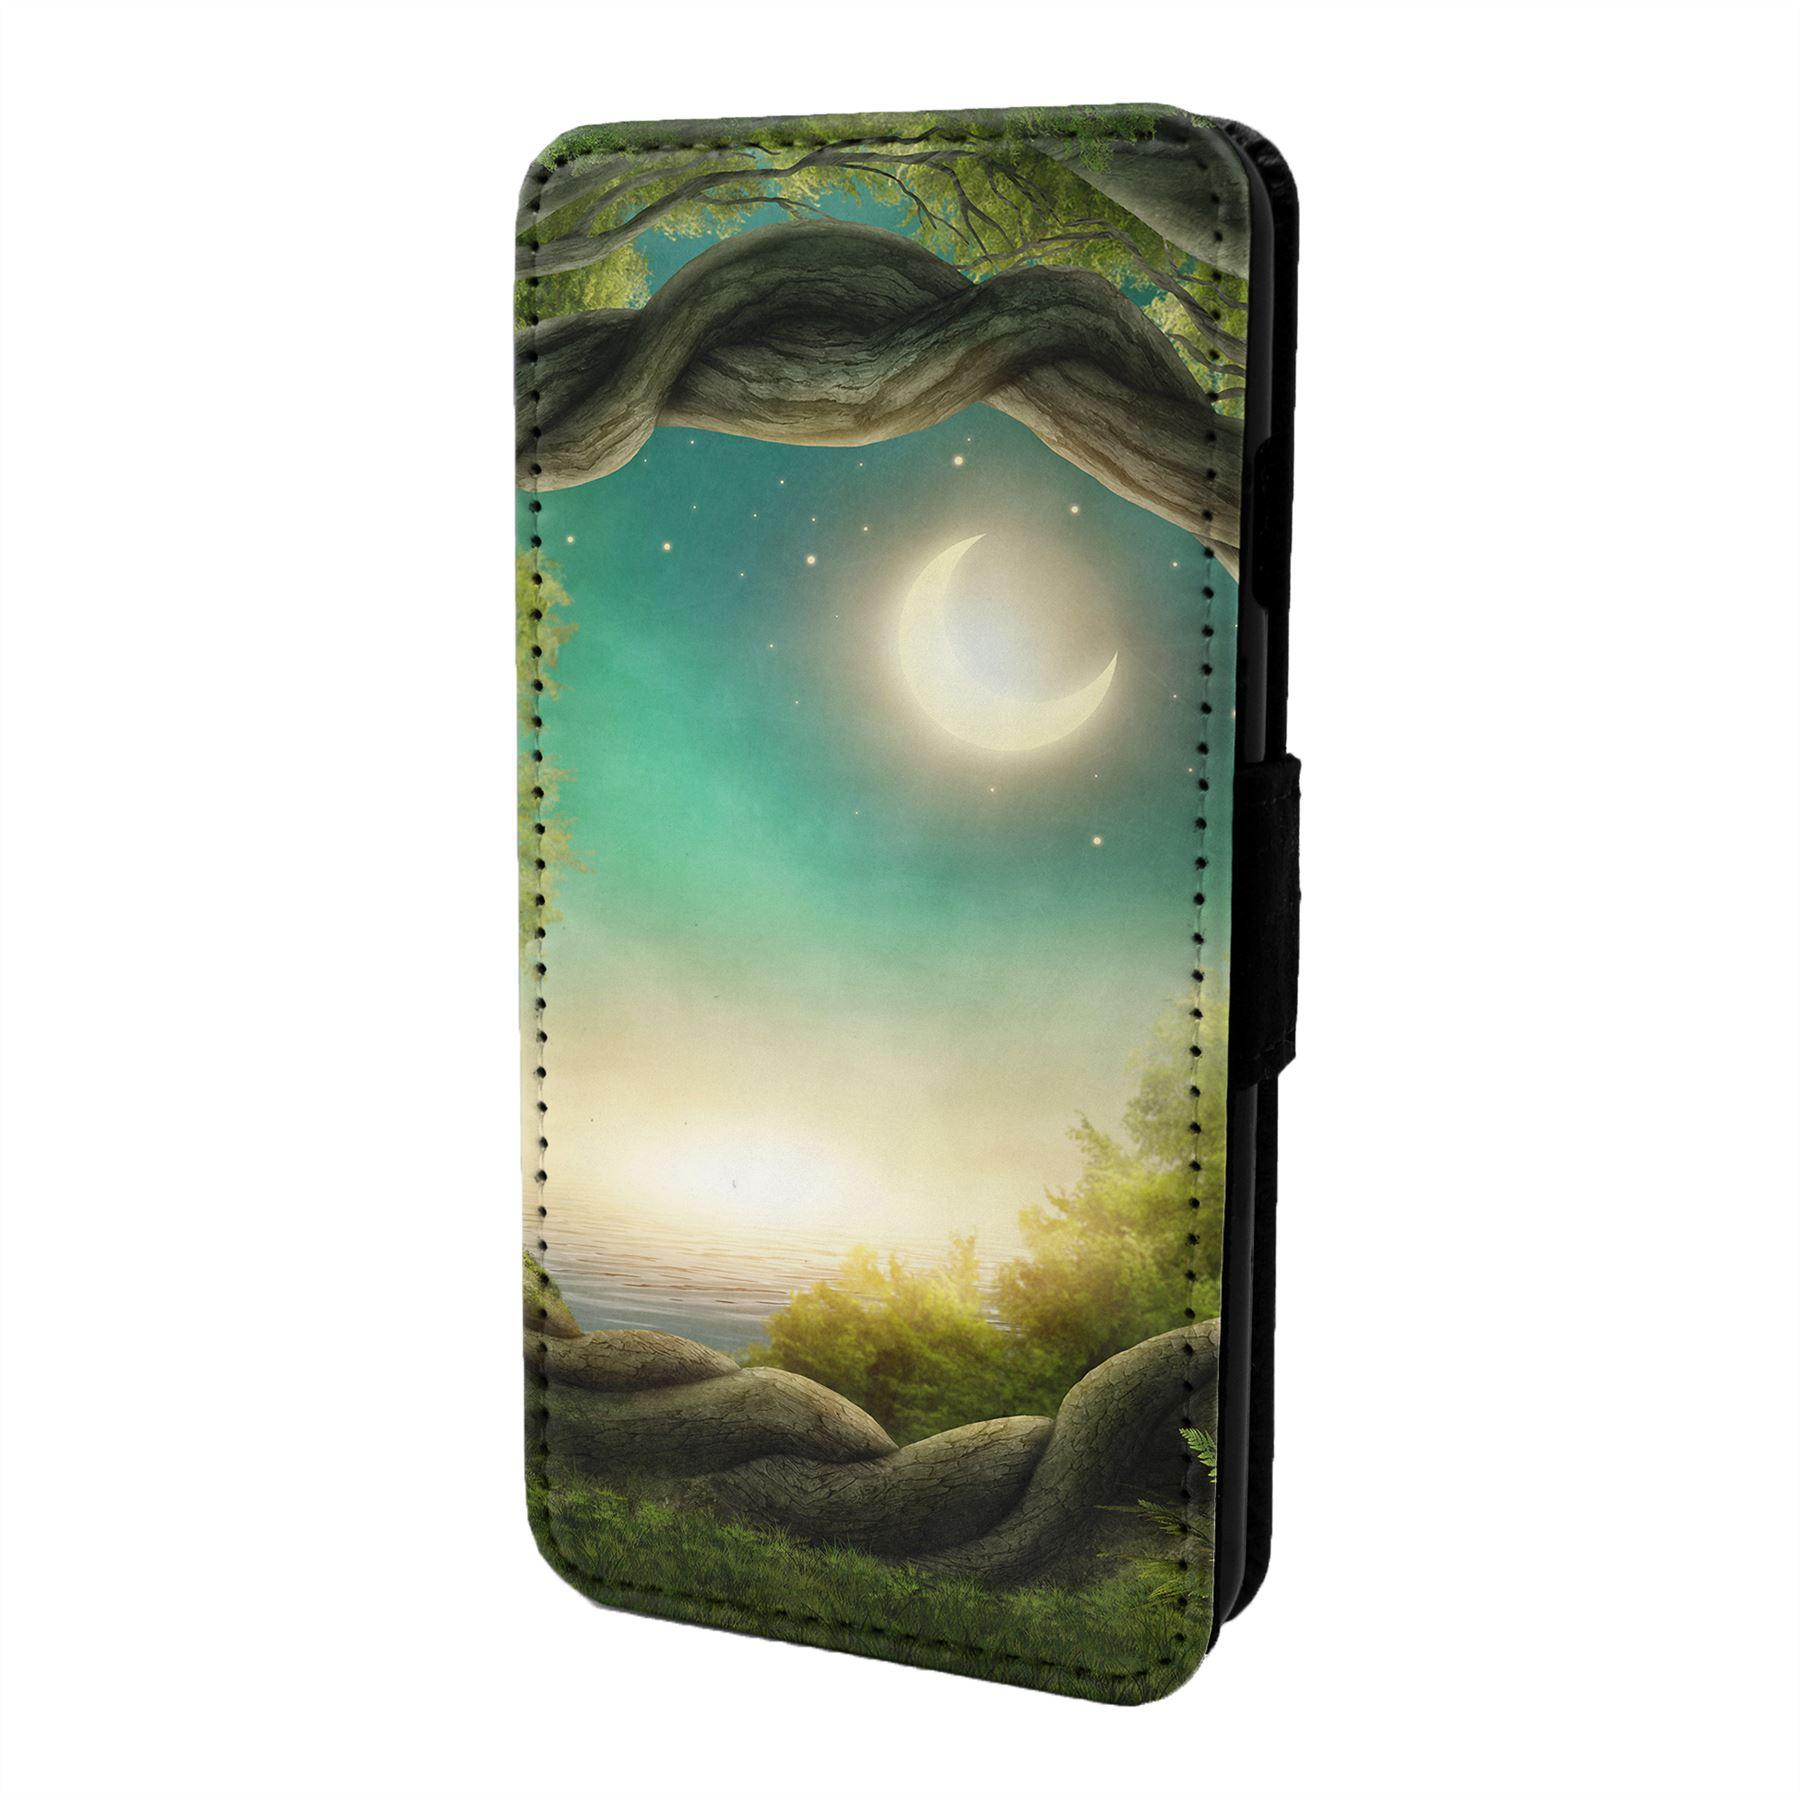 Magico-Paisaje-Estampado-Funda-Libro-para-Telefono-Movil-S6871